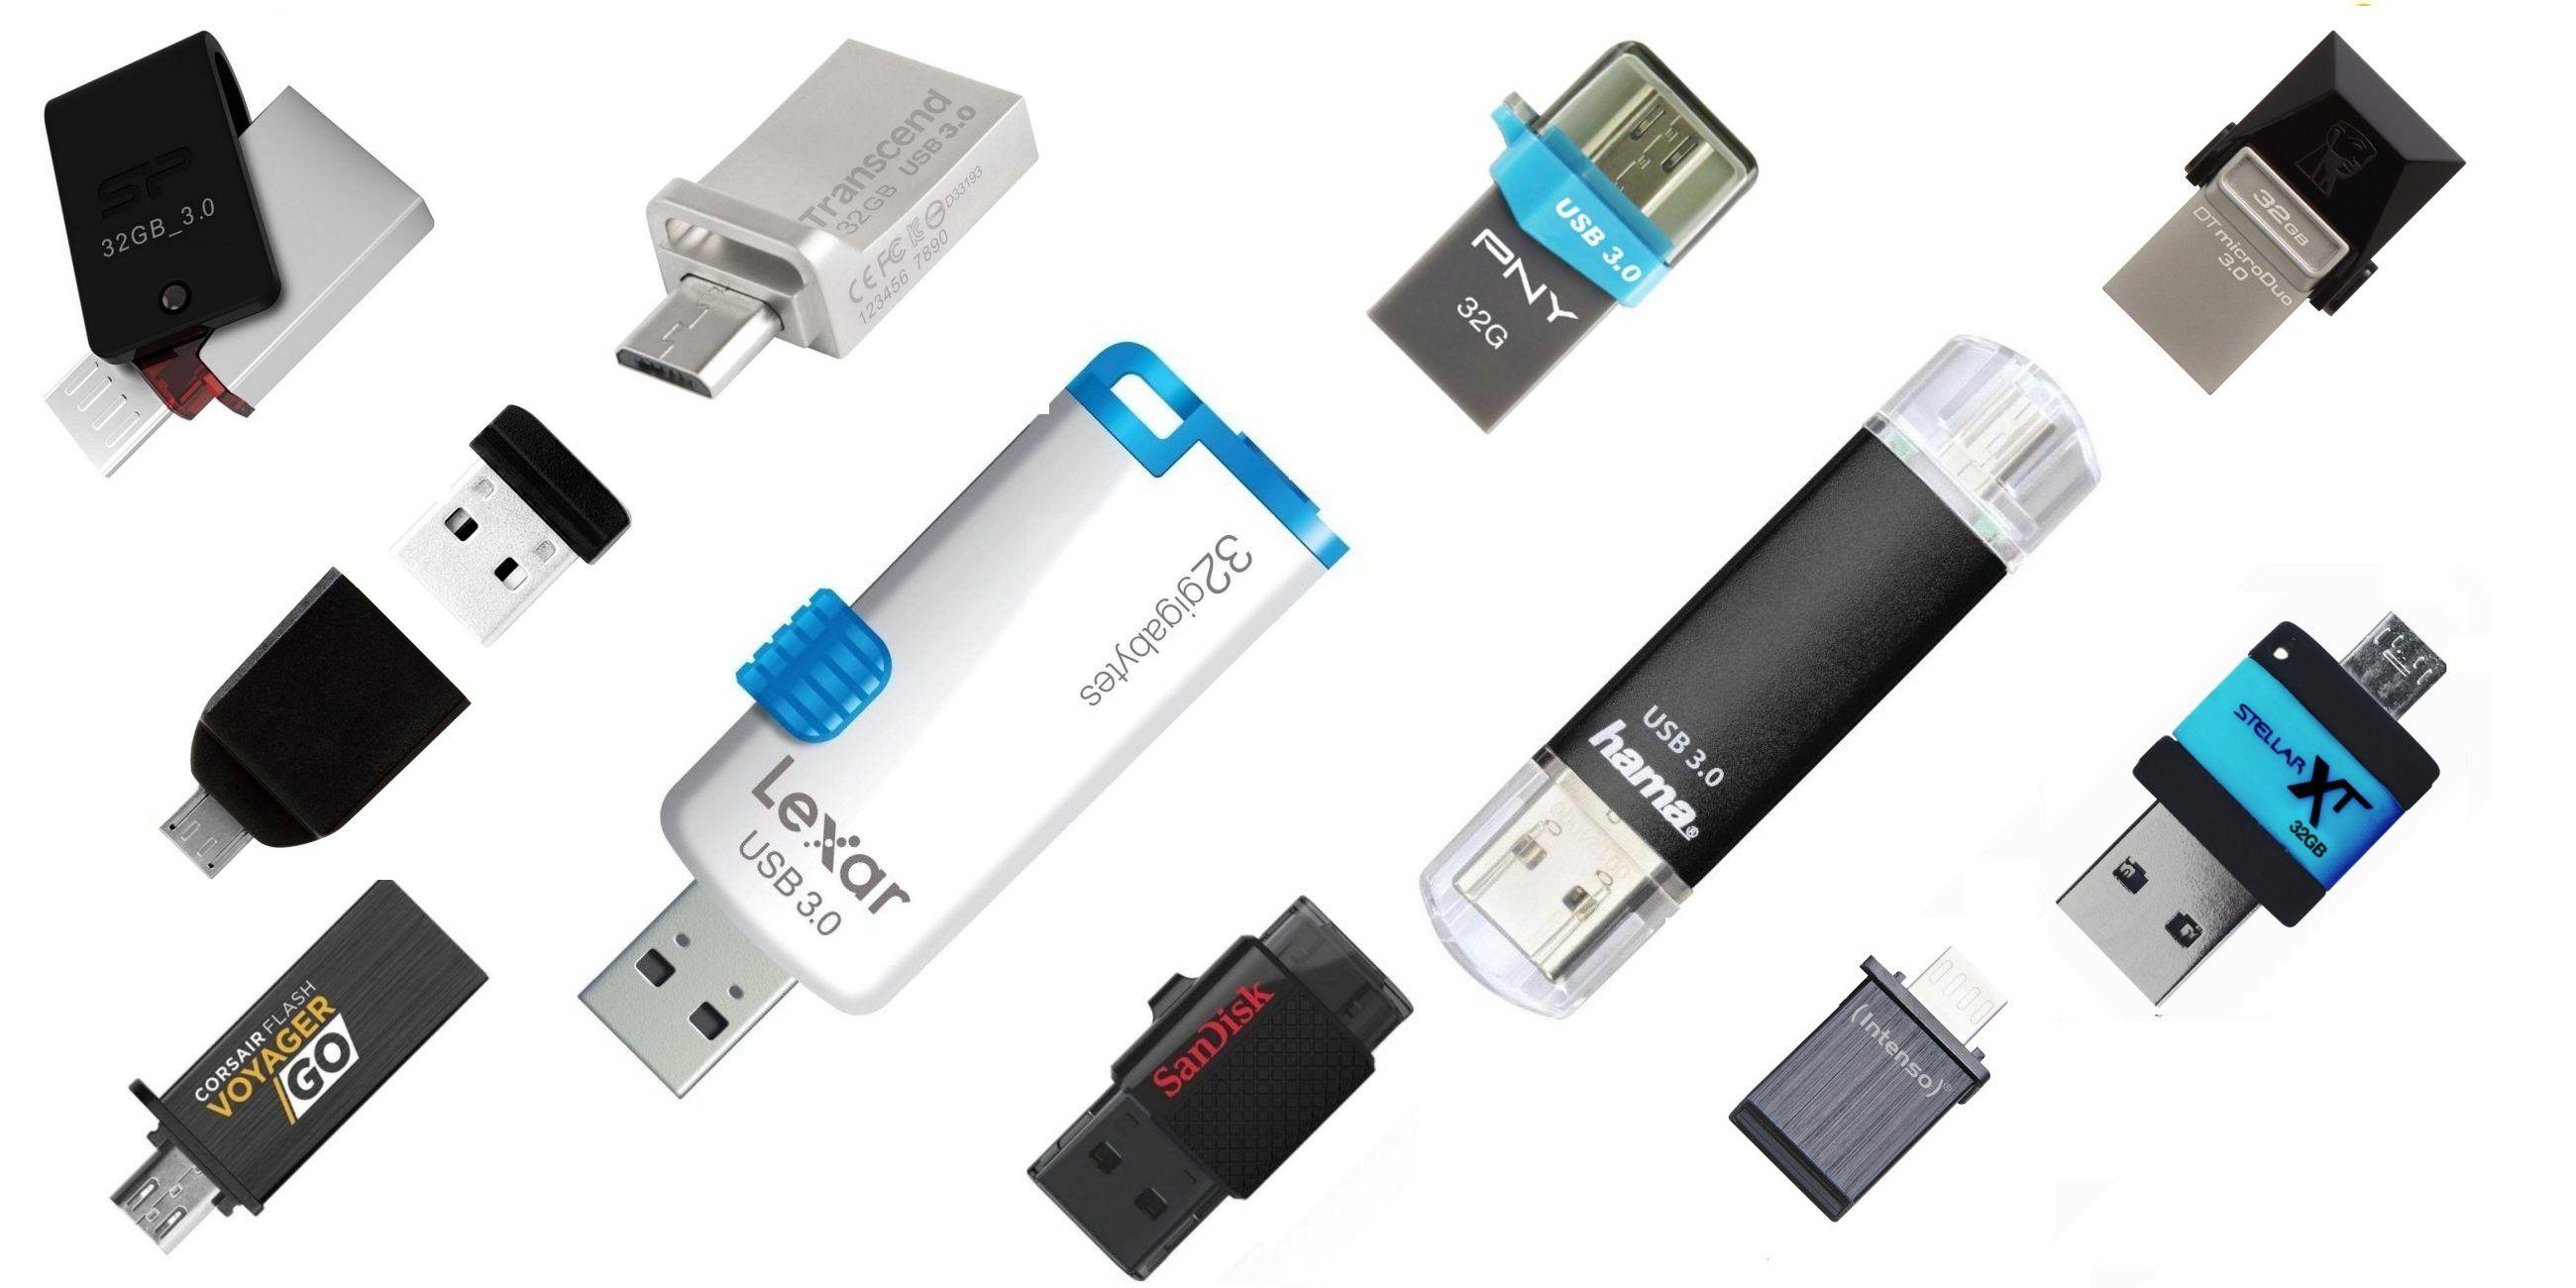 Usb On The Go Otg Sticks Mit 32 Gb Im Test Pc Welt Flashdisk Sandisk Vergrern Gigabyte